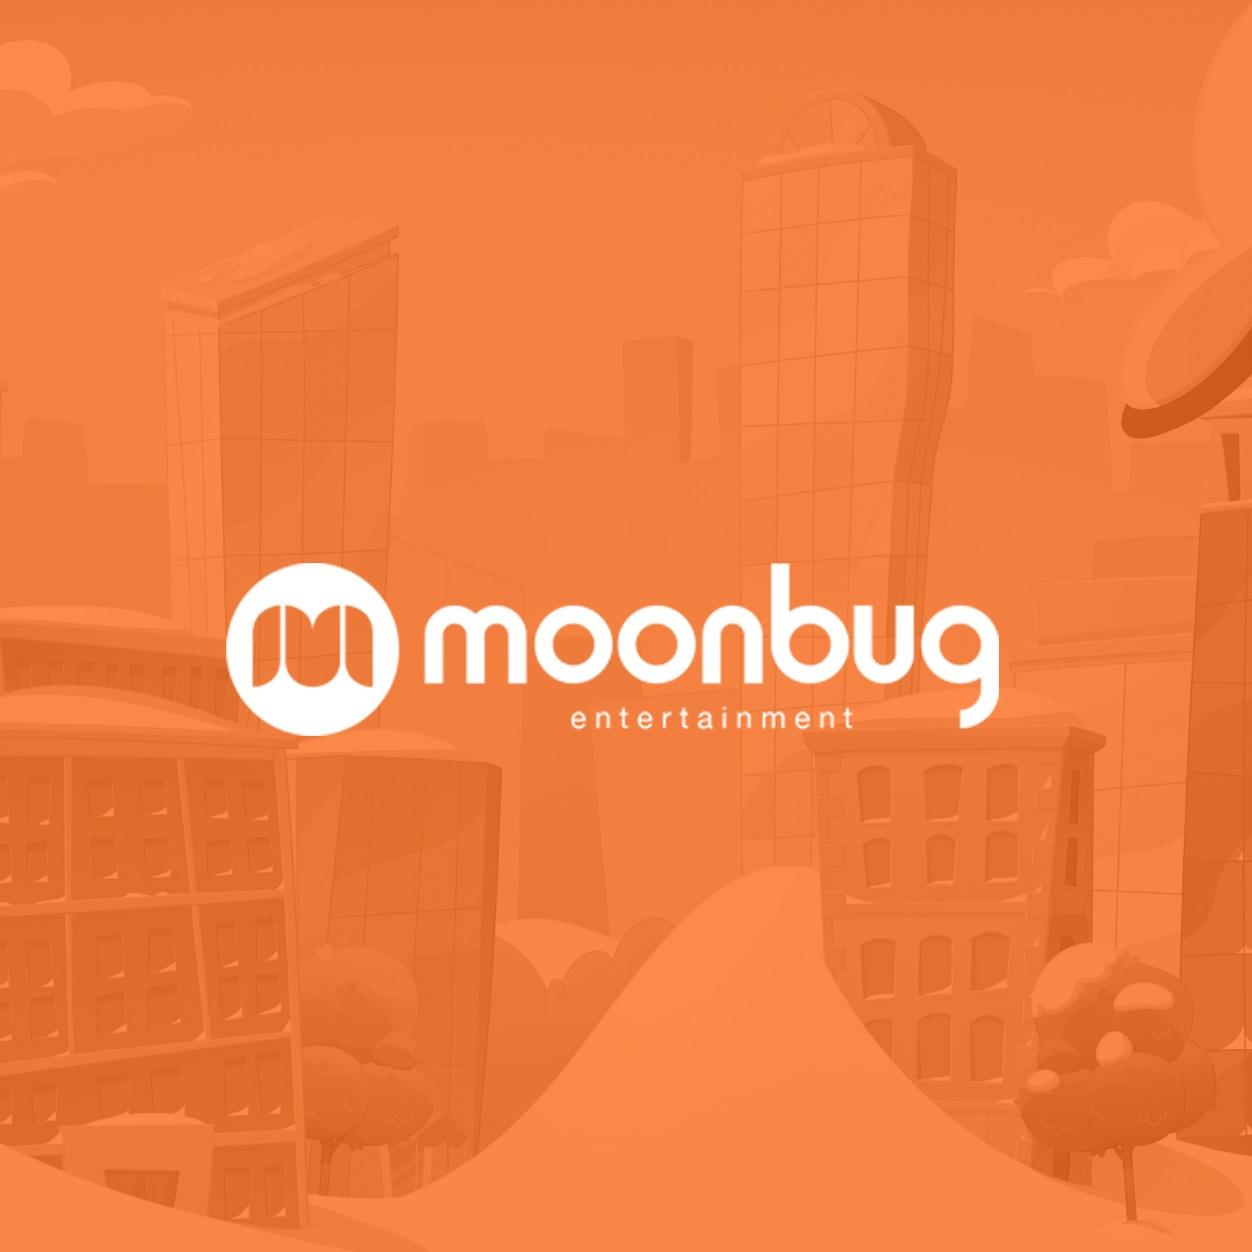 moonbug.jpg